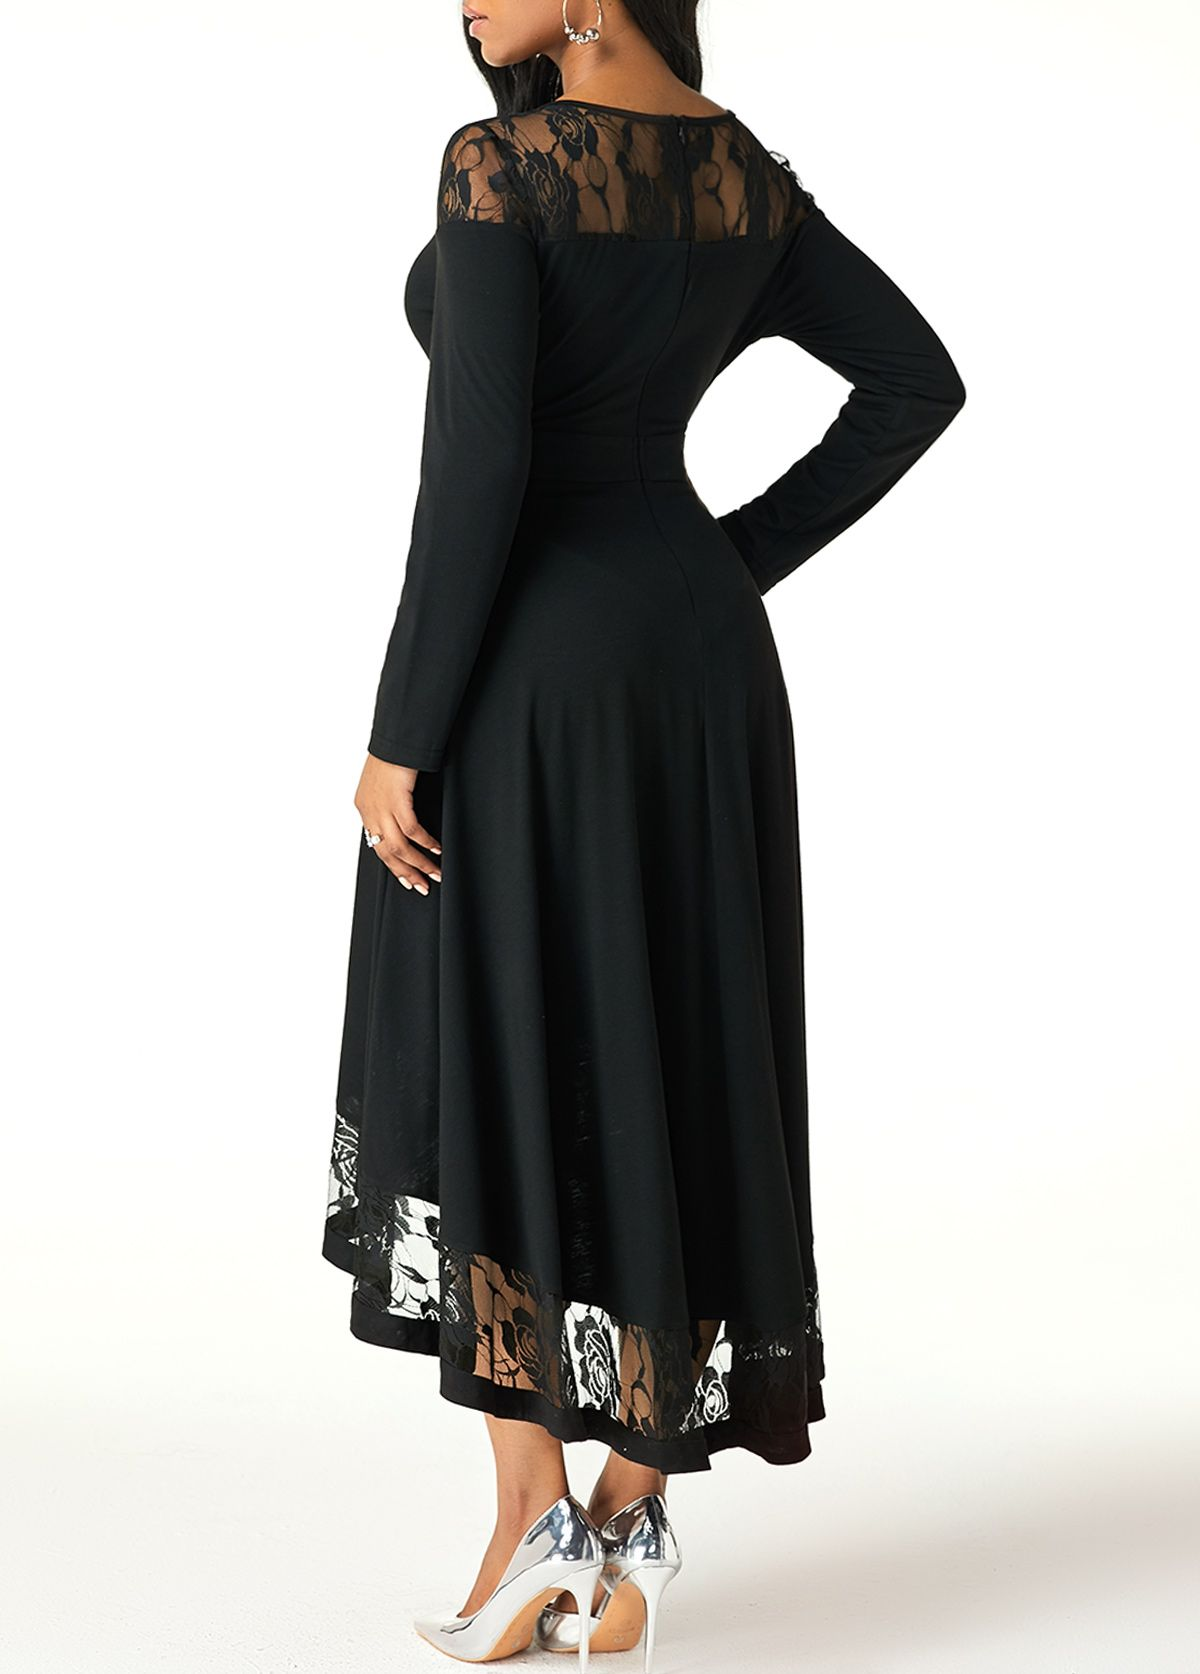 High Low Lace Patchwork Long Sleeve Dress Rotita Com Usd 31 96 Long Sleeve High Low Dress Long Sleeve Dress Shop Casual Dresses [ 1674 x 1200 Pixel ]